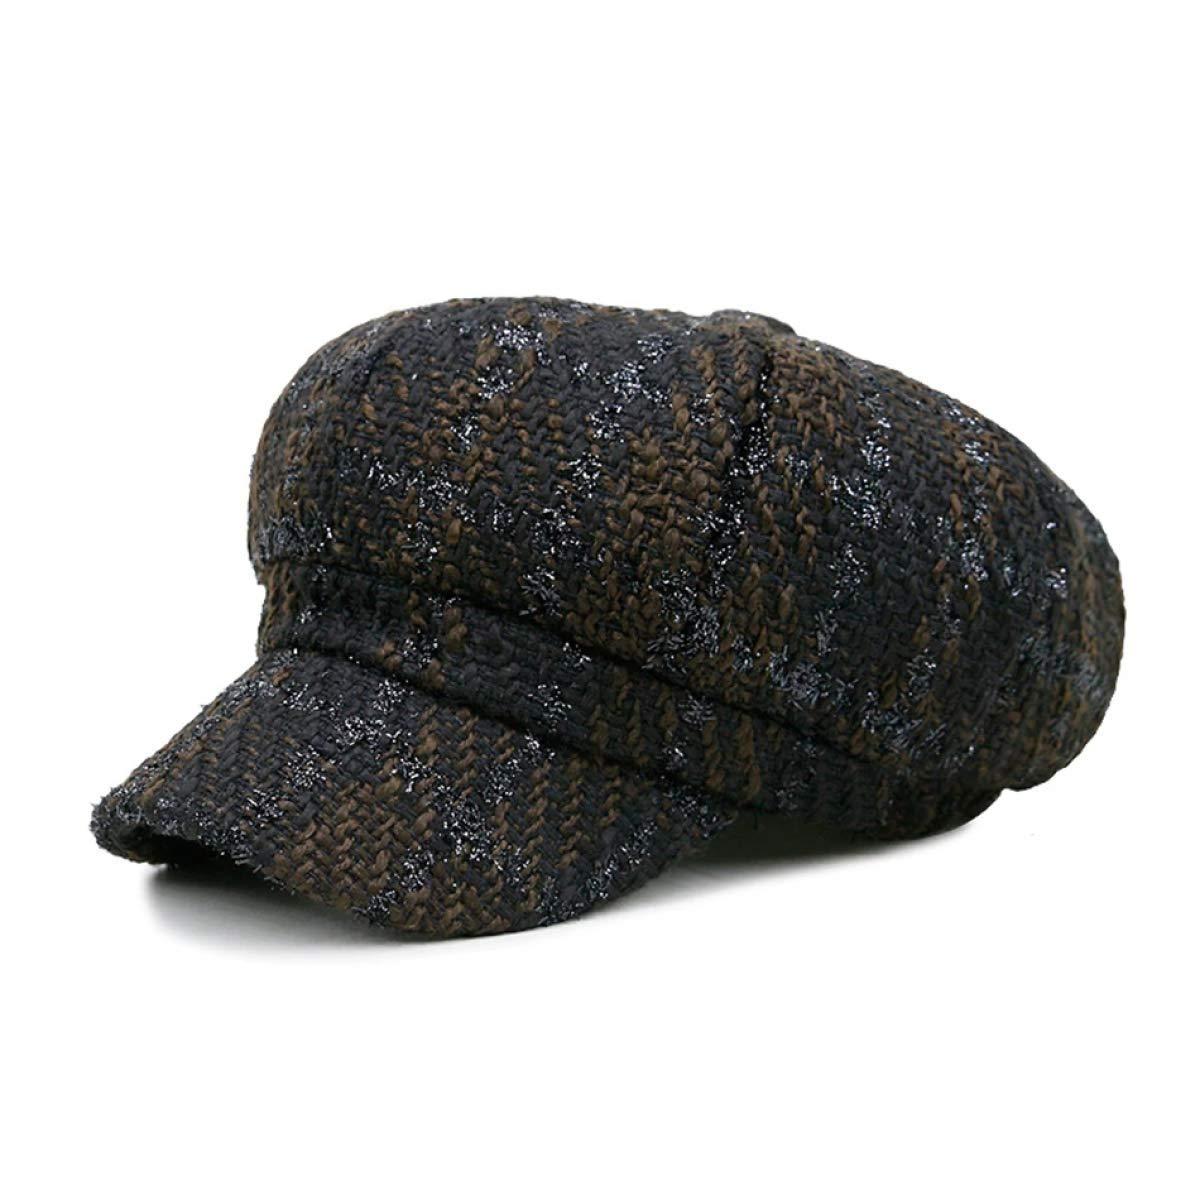 Baker boy Cap Newsboy Caps Women Spring Autumn Baker Boy Vintage Octagonal Cap Lady Hats Elastic Casual British Beret